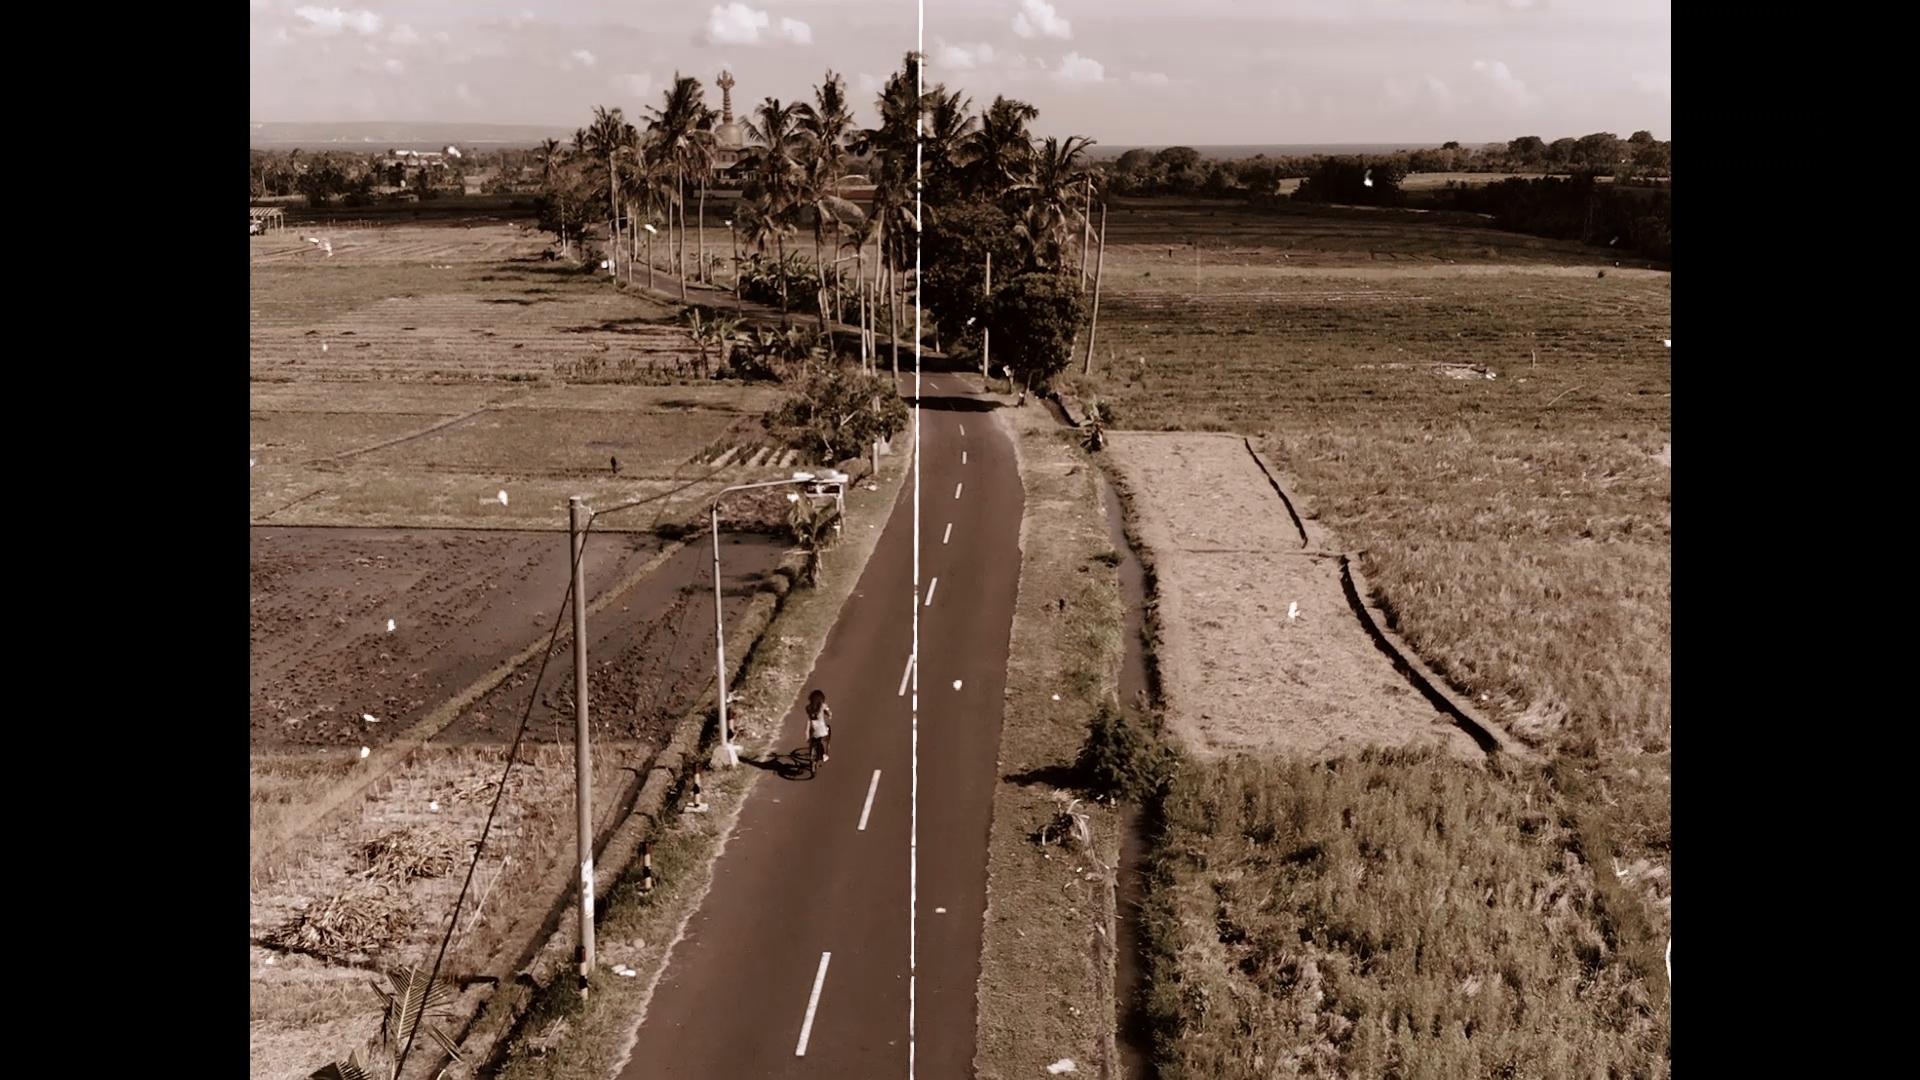 024-cyclingcommando-Putri-Cinta-teaser-stills-2.jpg